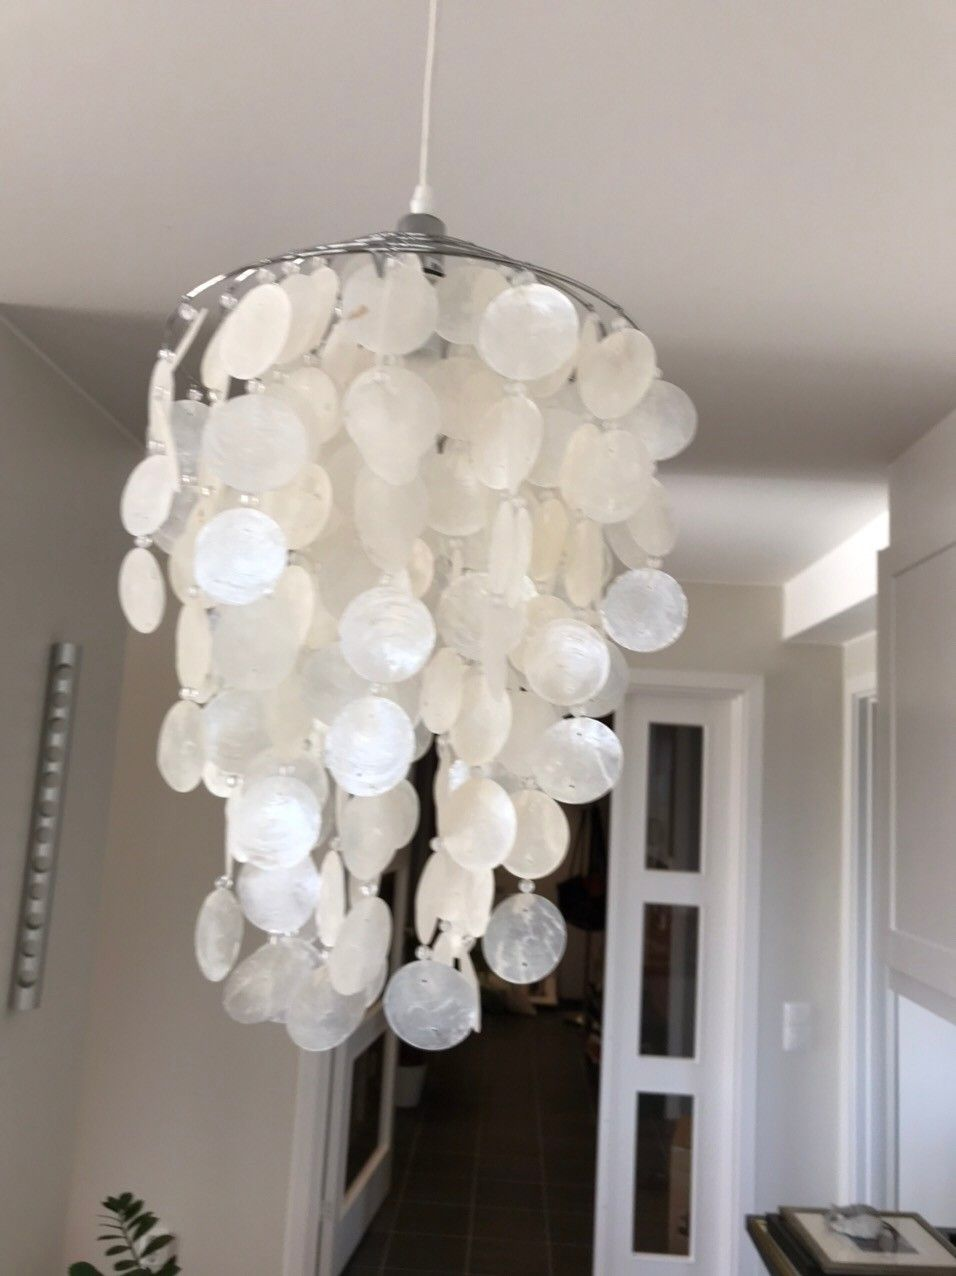 Skjell lampe | FINN.no